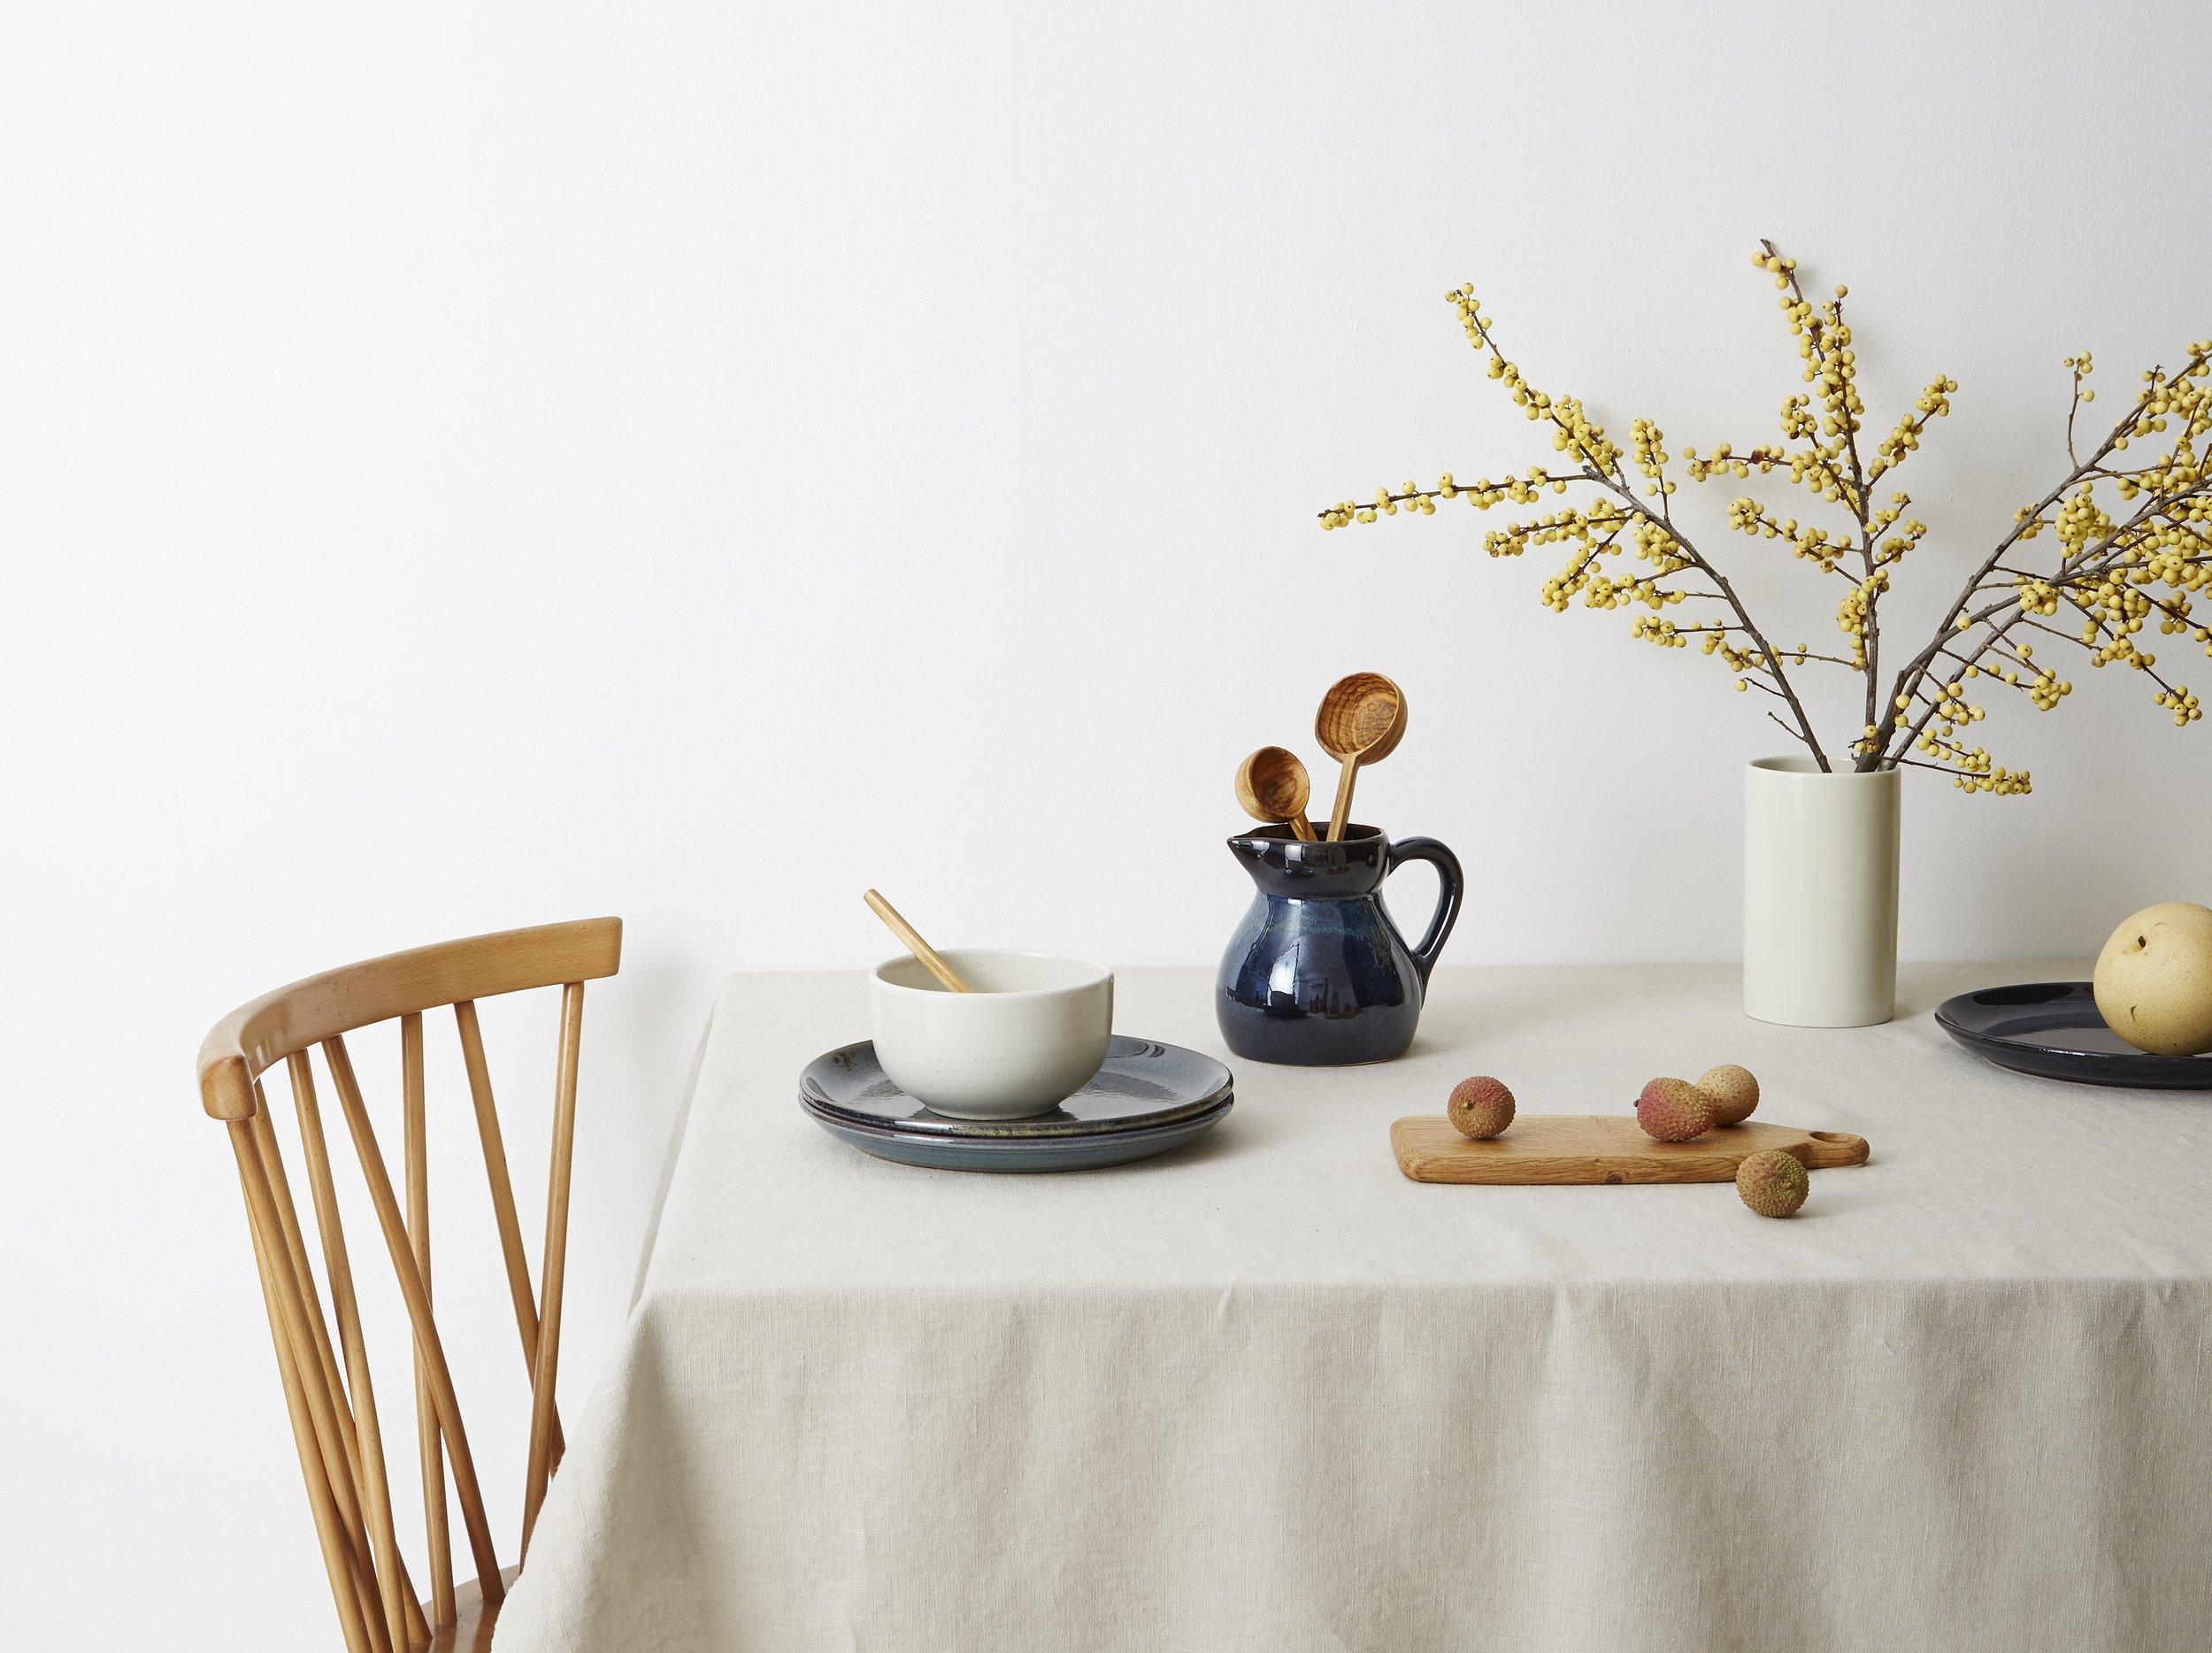 minor-goods-stoneware-range-lifestyle-on-table-hr